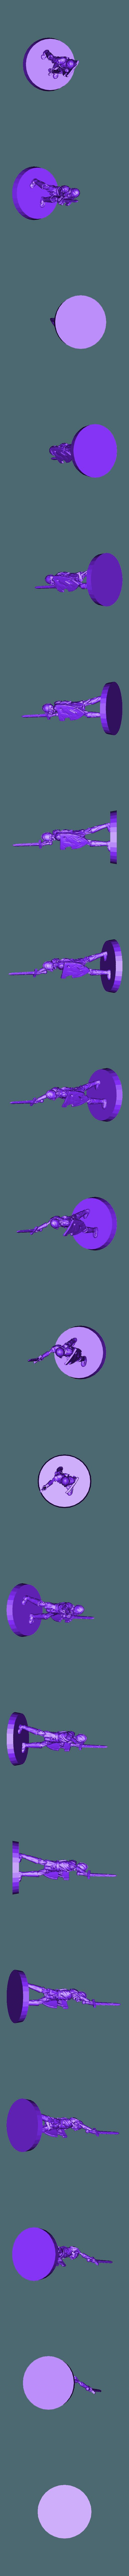 skeleton_warrior_round_base_v2.stl Télécharger fichier STL gratuit Skeleton Warrior Miniature version #2 • Design pour impression 3D, Ilhadiel